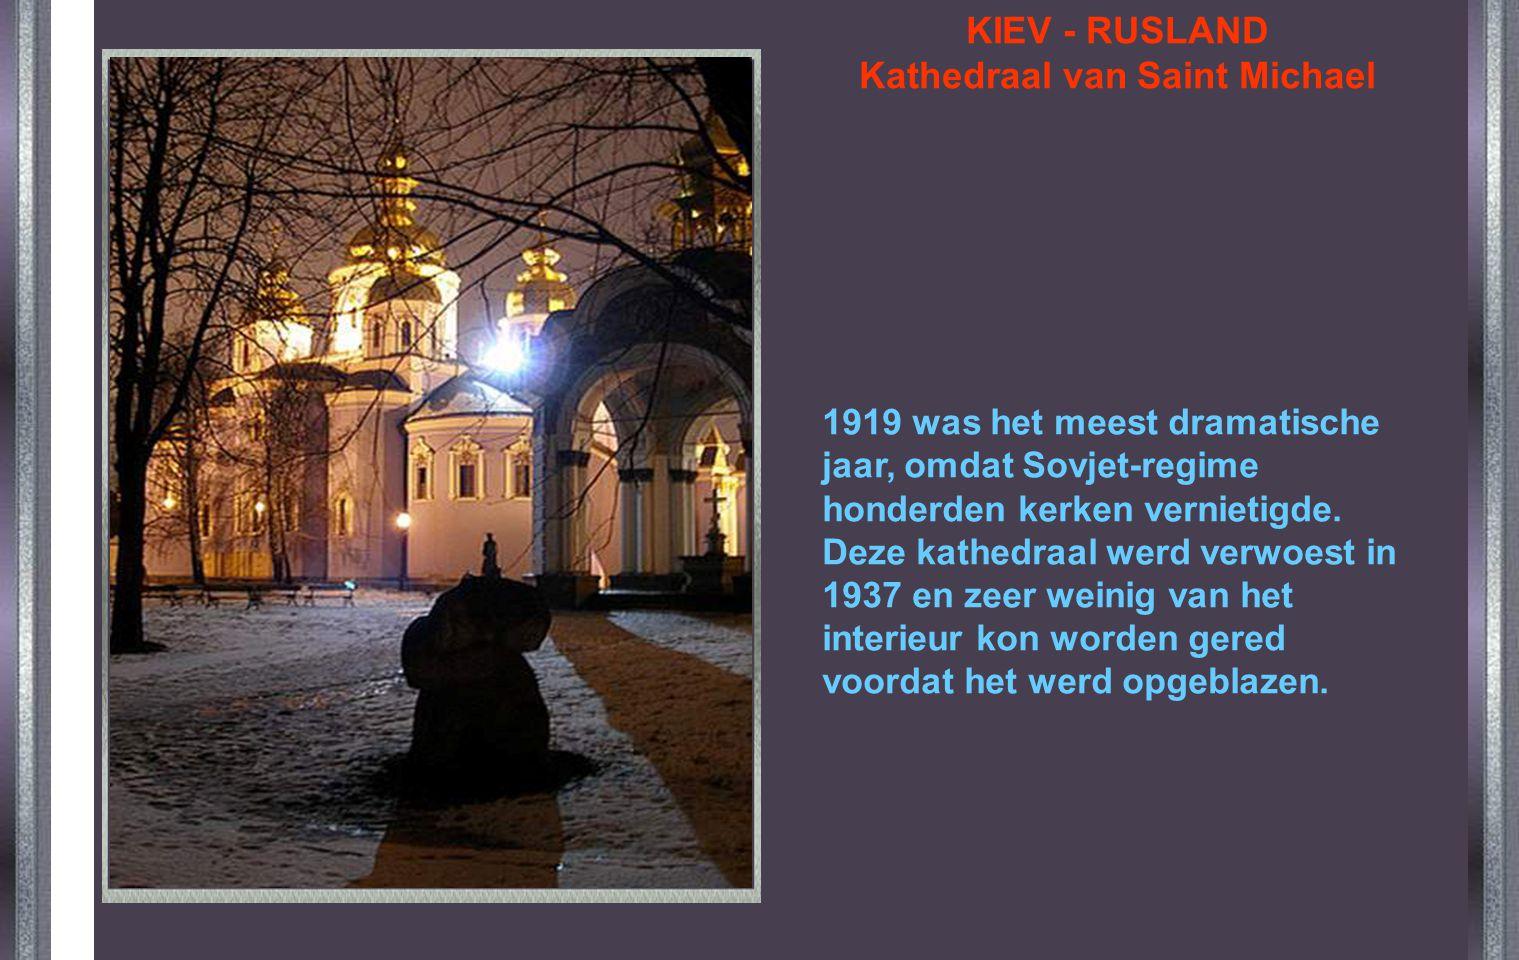 KIEV - RUSLAND Kathedraal van Saint Michael